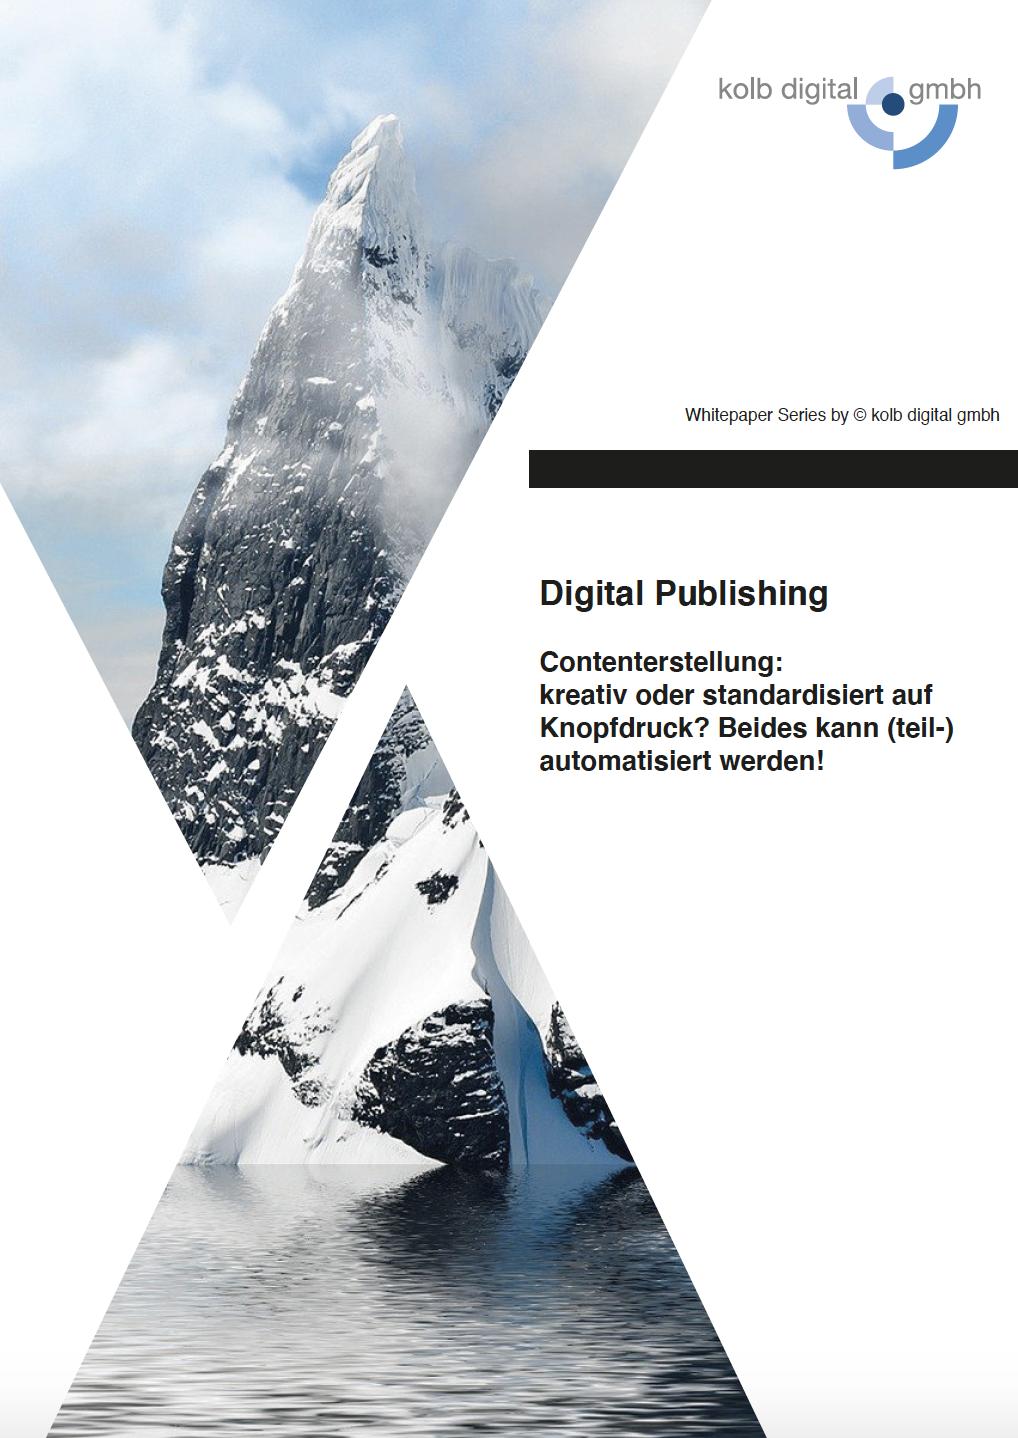 kolb digital whitepaper print publishing